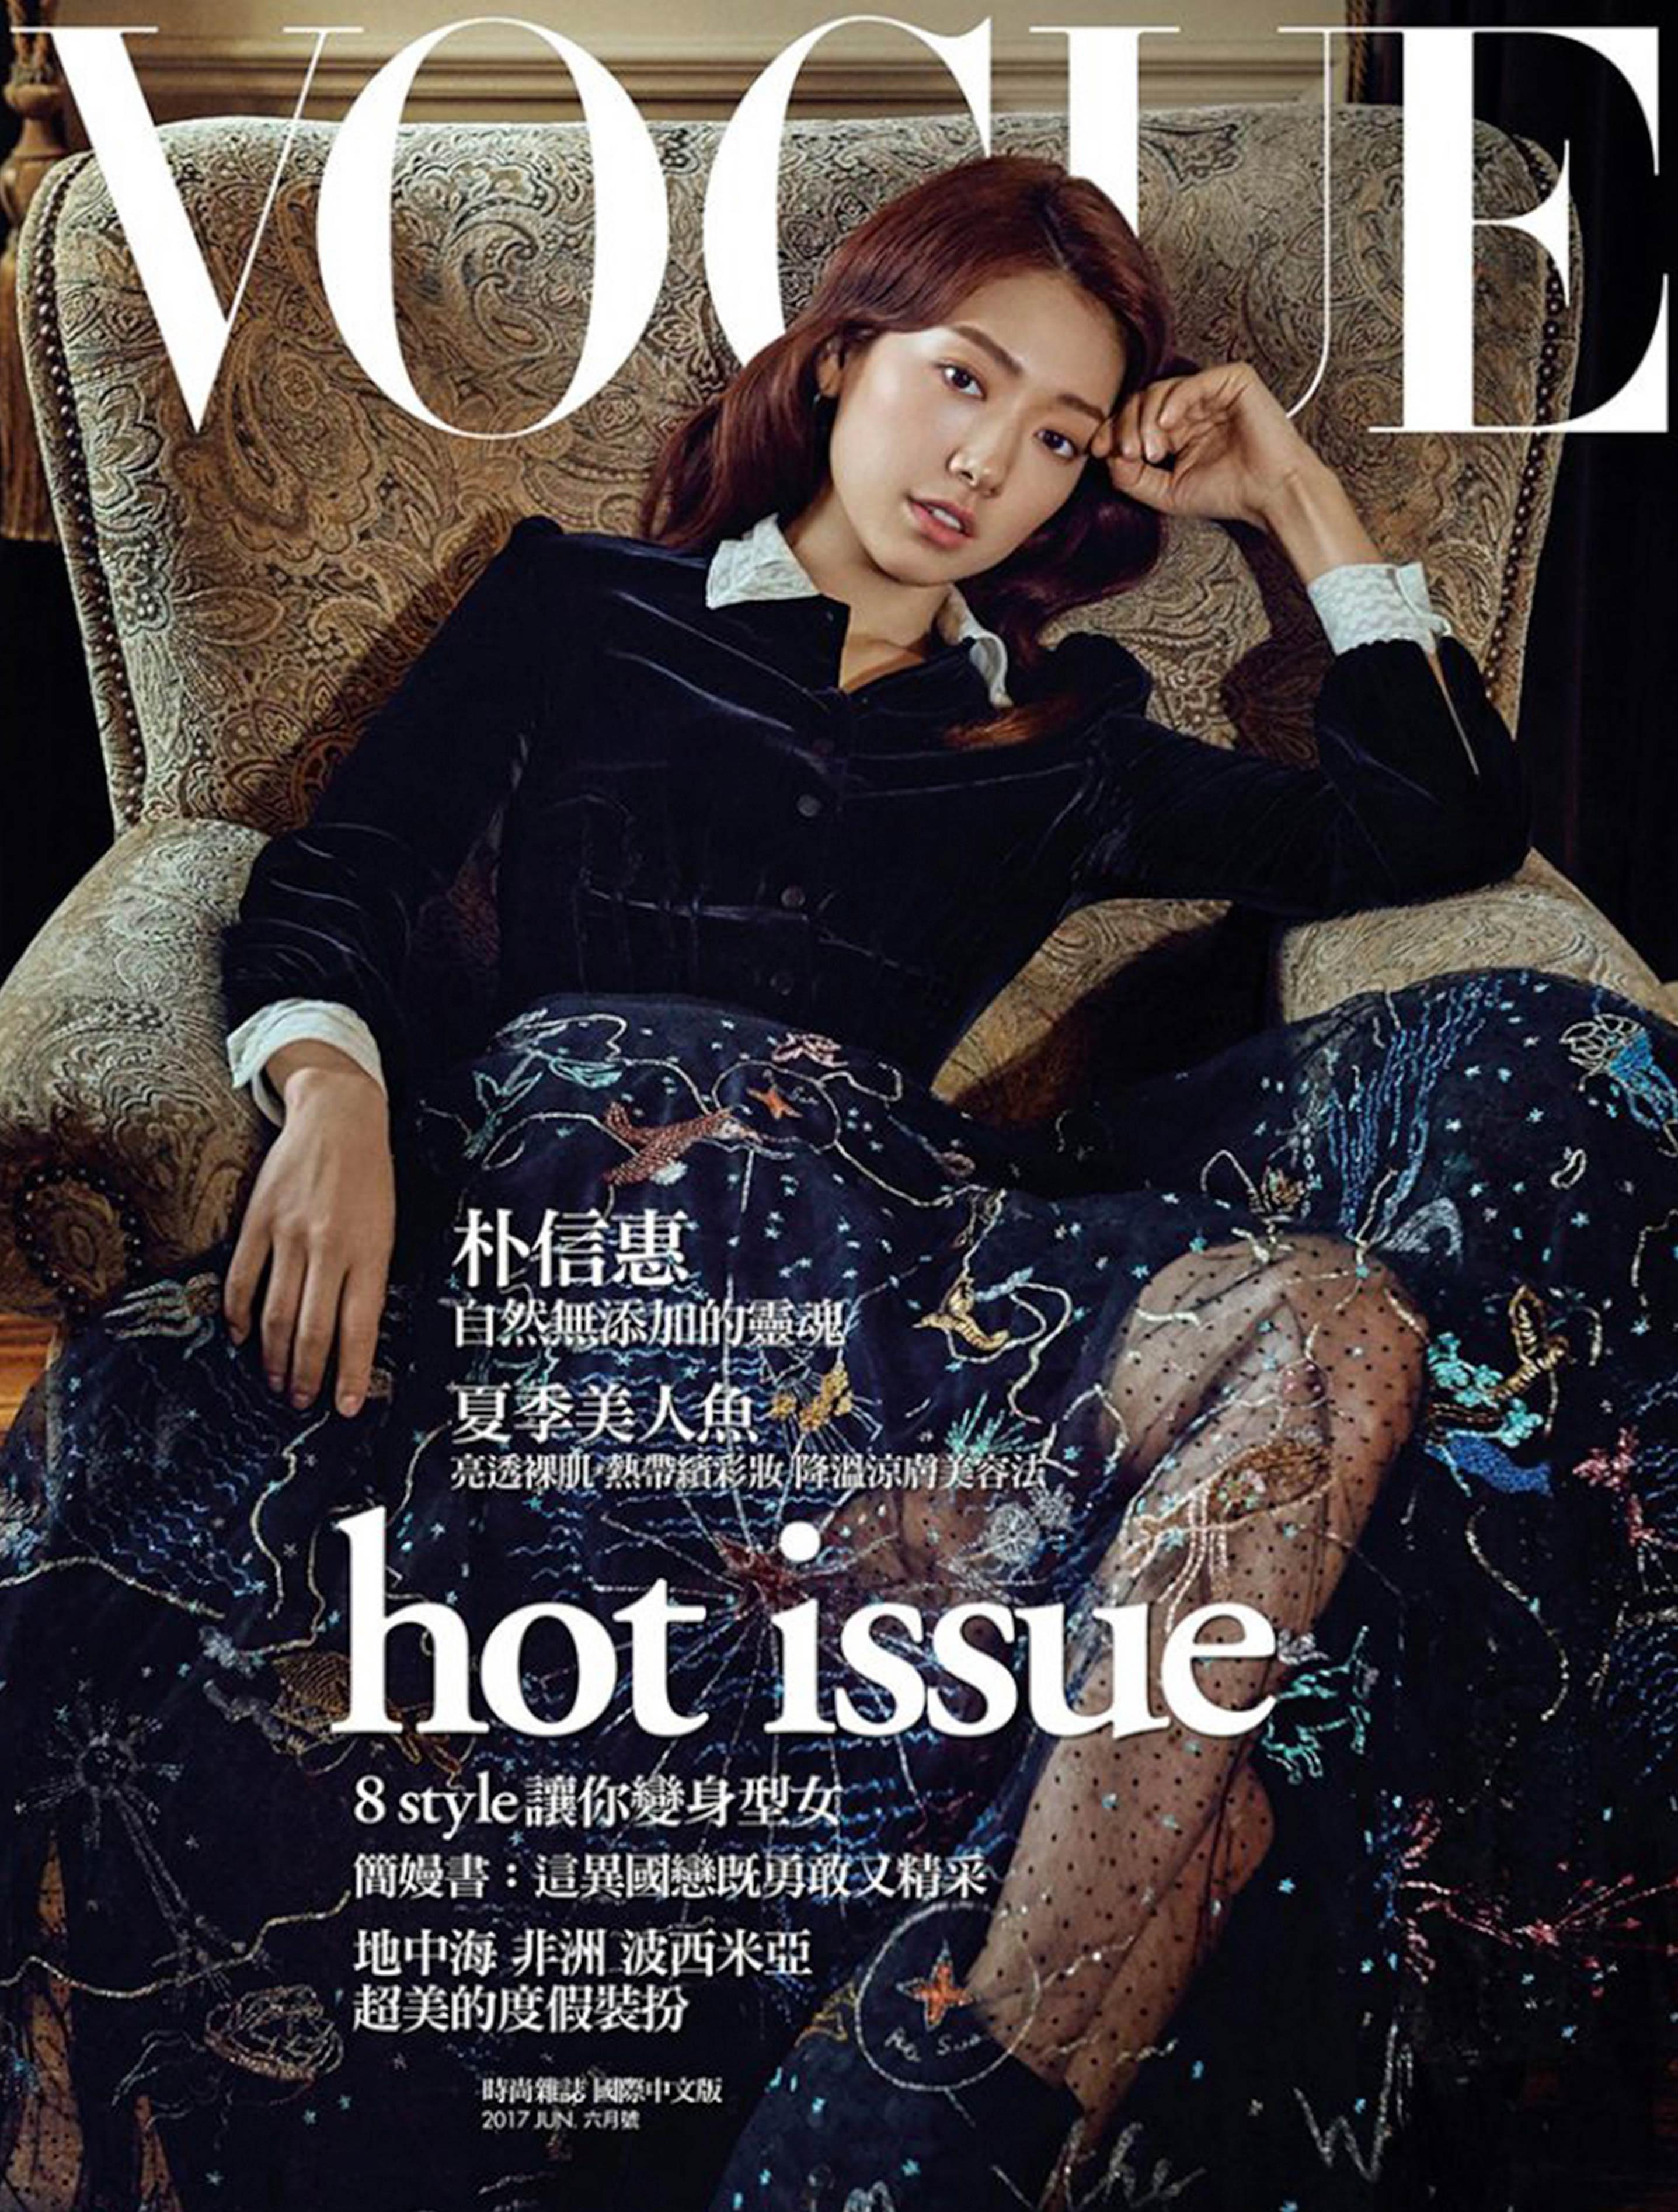 Vogue Taiwan, June 2017